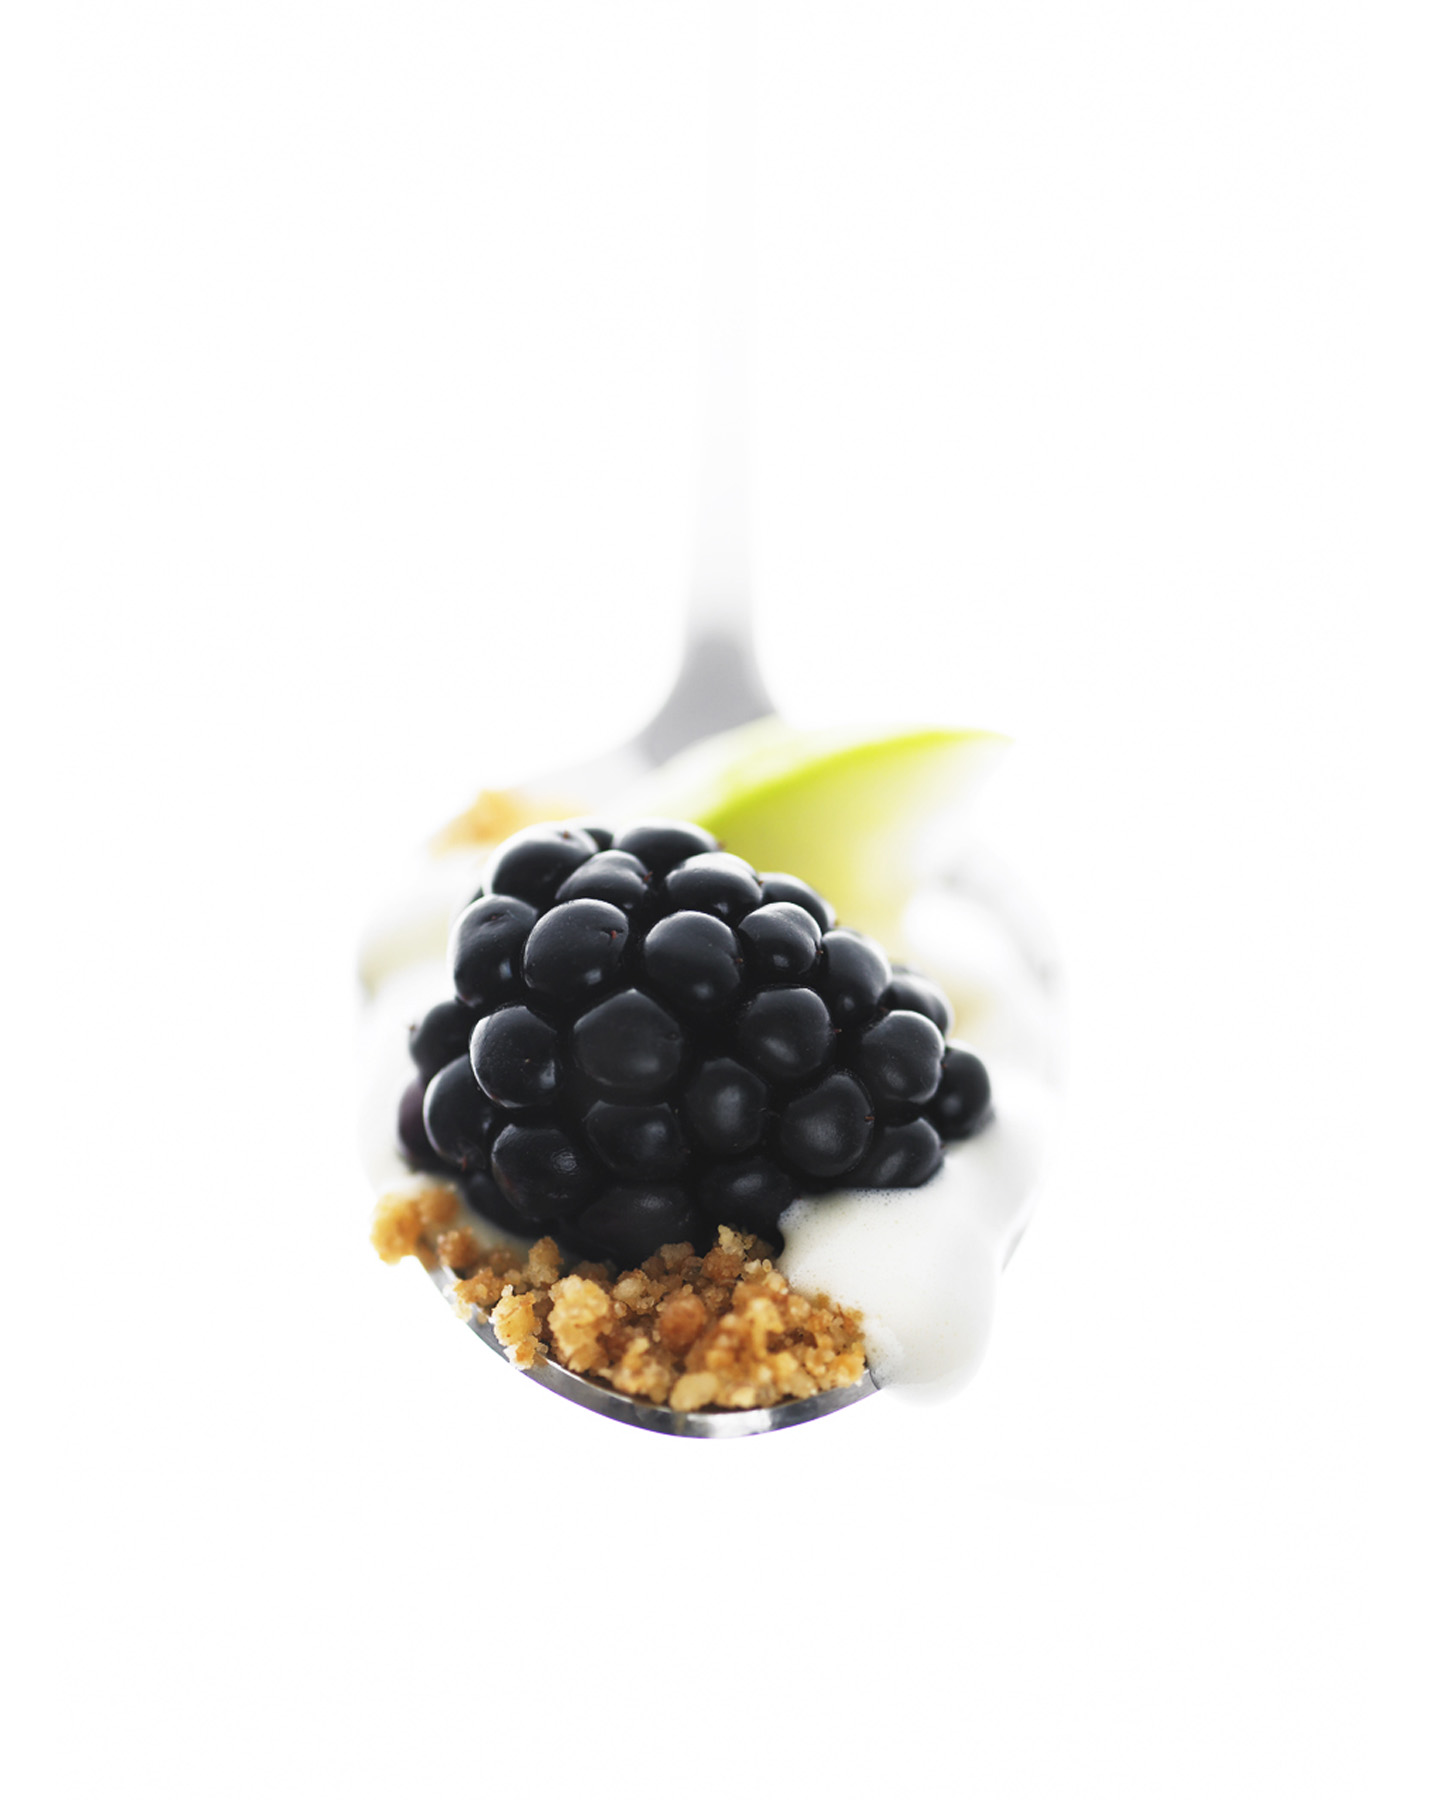 22-icon-artist-management-katie-hammond-food-waitrose_blackcurrant_spoon.jpg